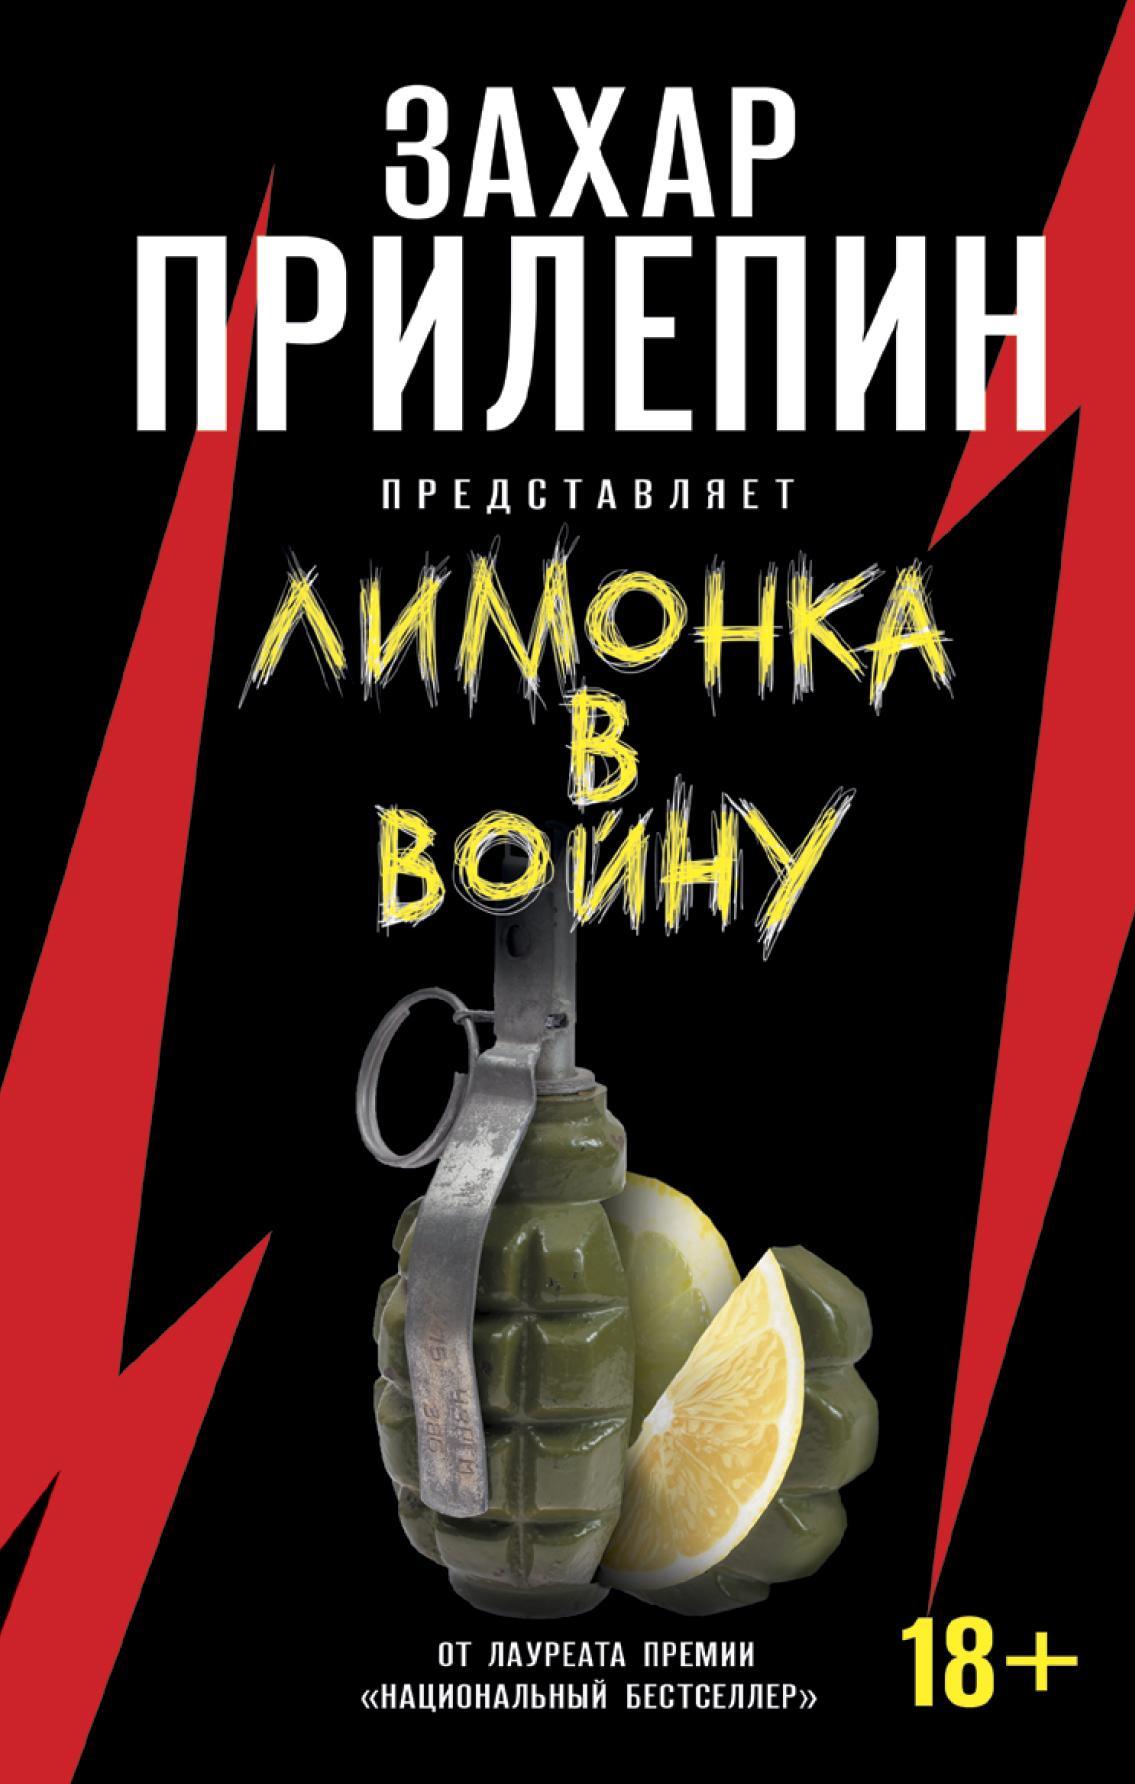 "Книга ""Лимонка"" в войну. Прилепин Захар"